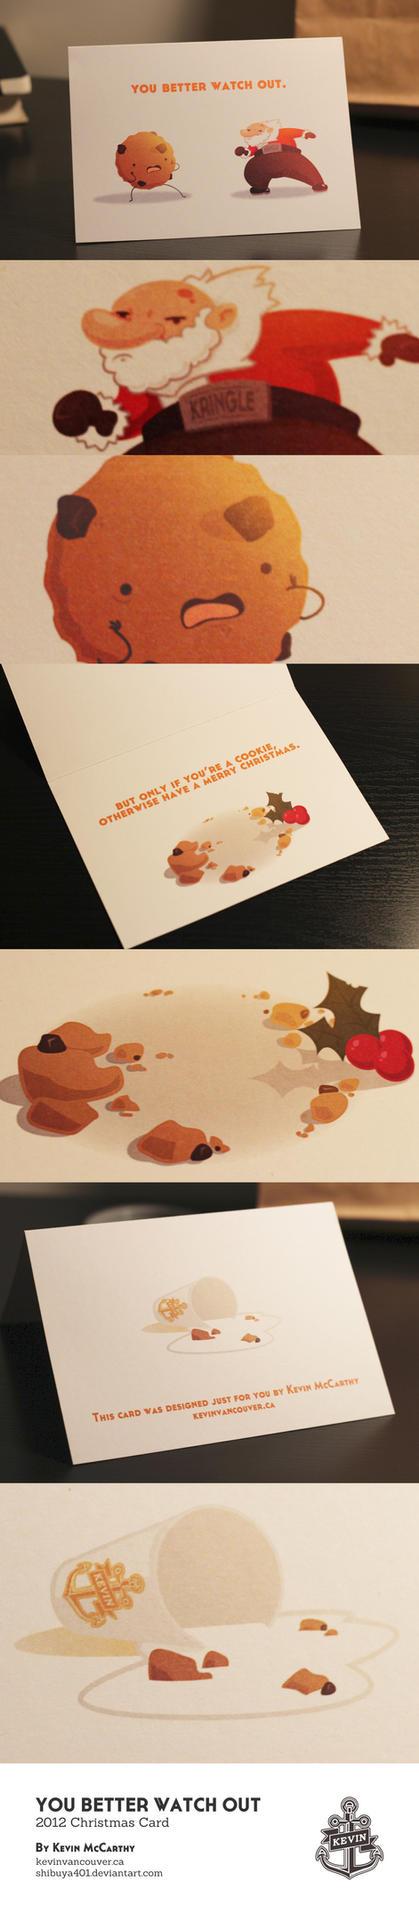 2012 Christmas Card by SHIBUYA401